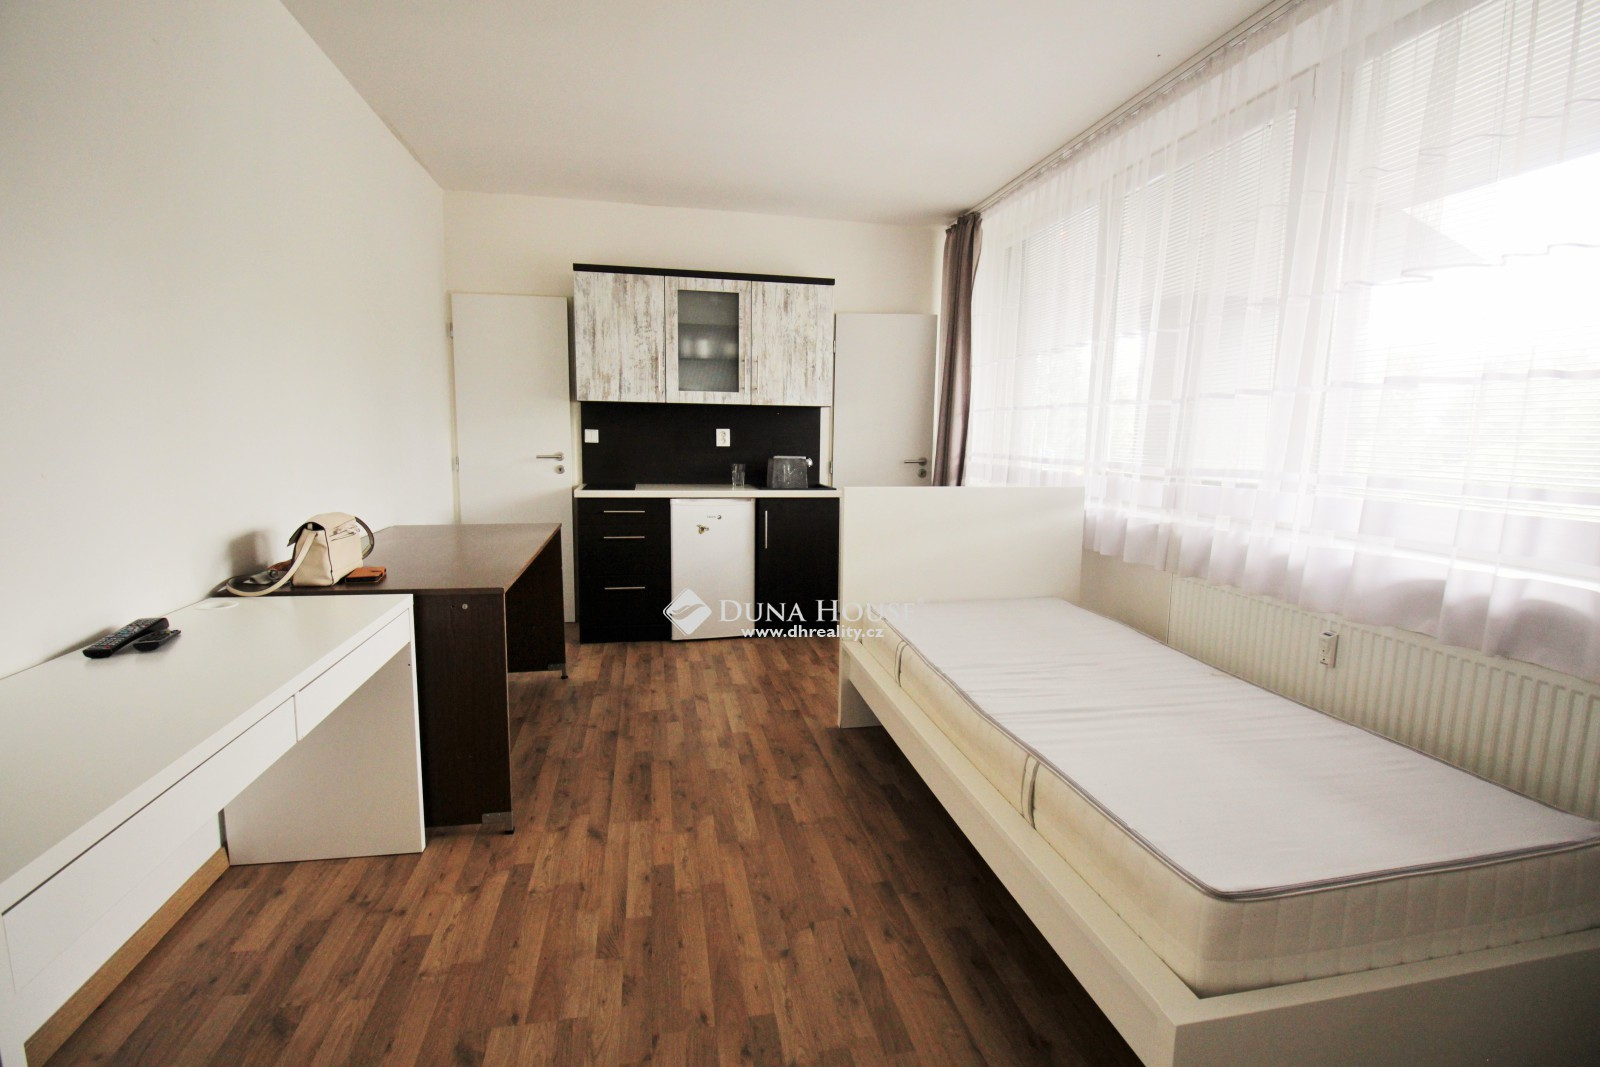 Prodej bytu, Hornoměcholupská, Praha 10 Hostivař